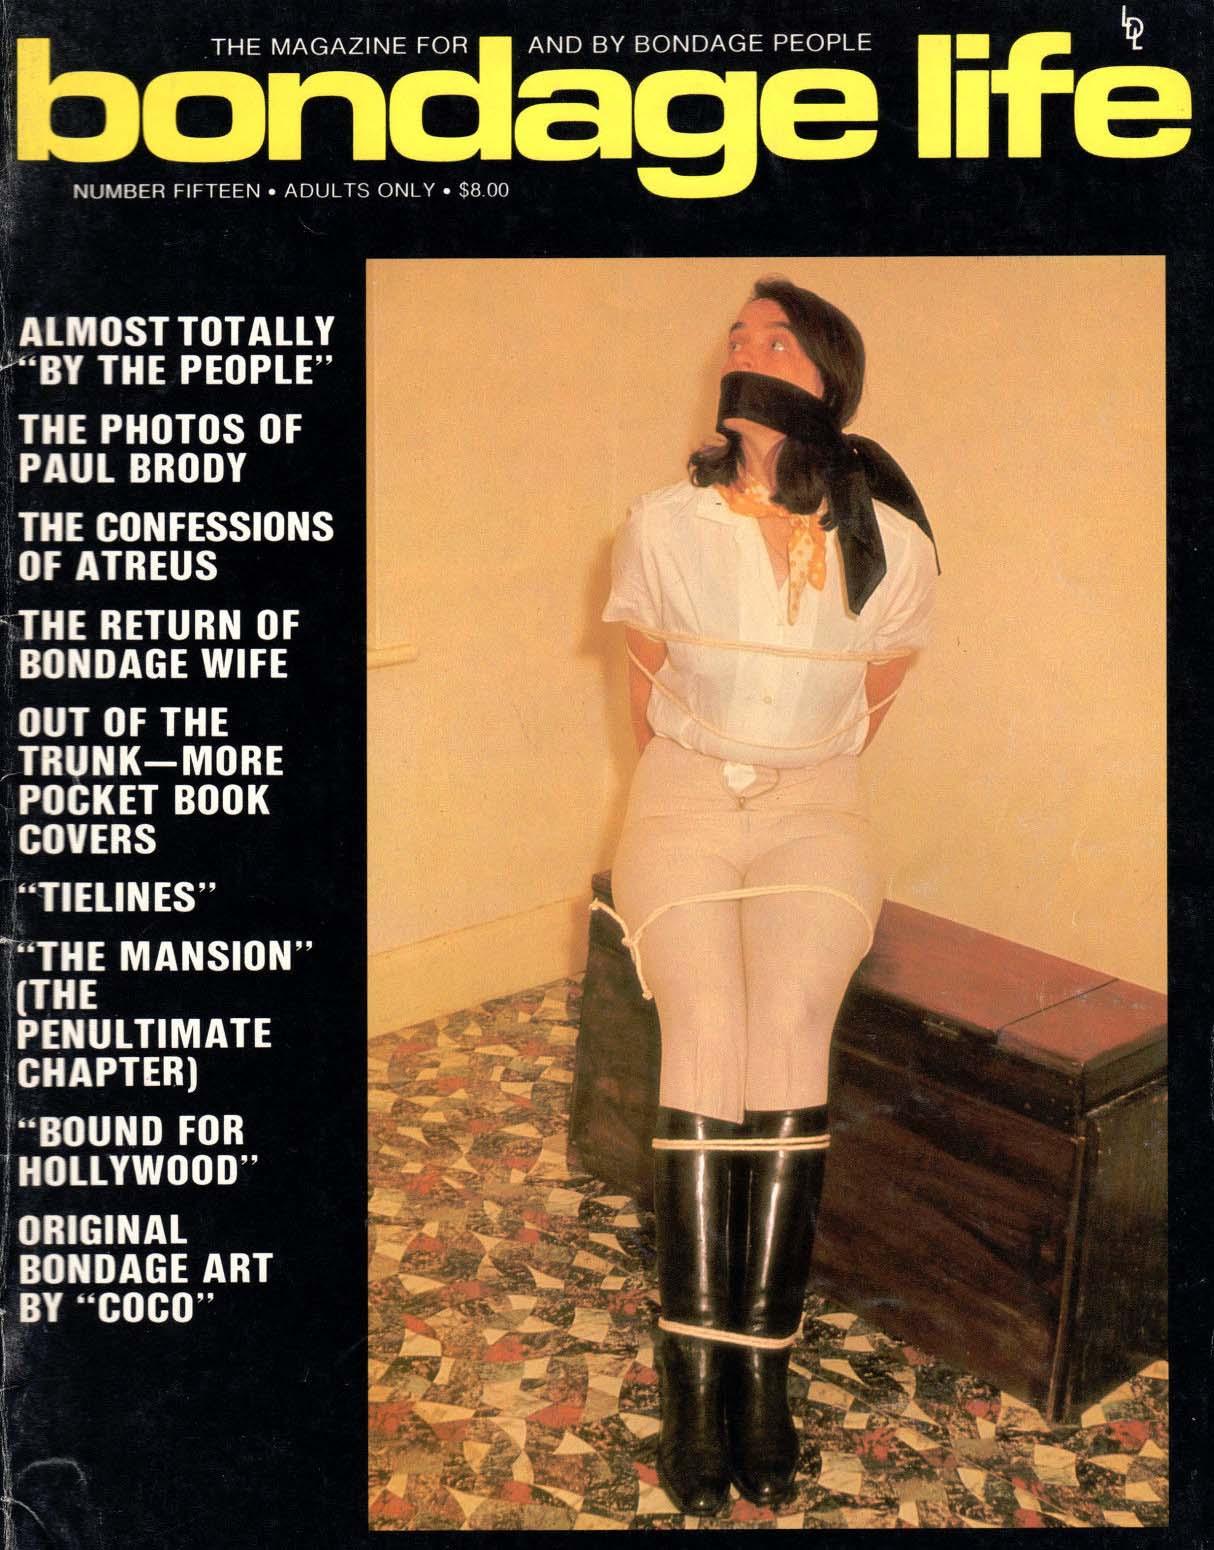 Bondage-Zeitschriften pdf, Heiße Rothaarige TGP